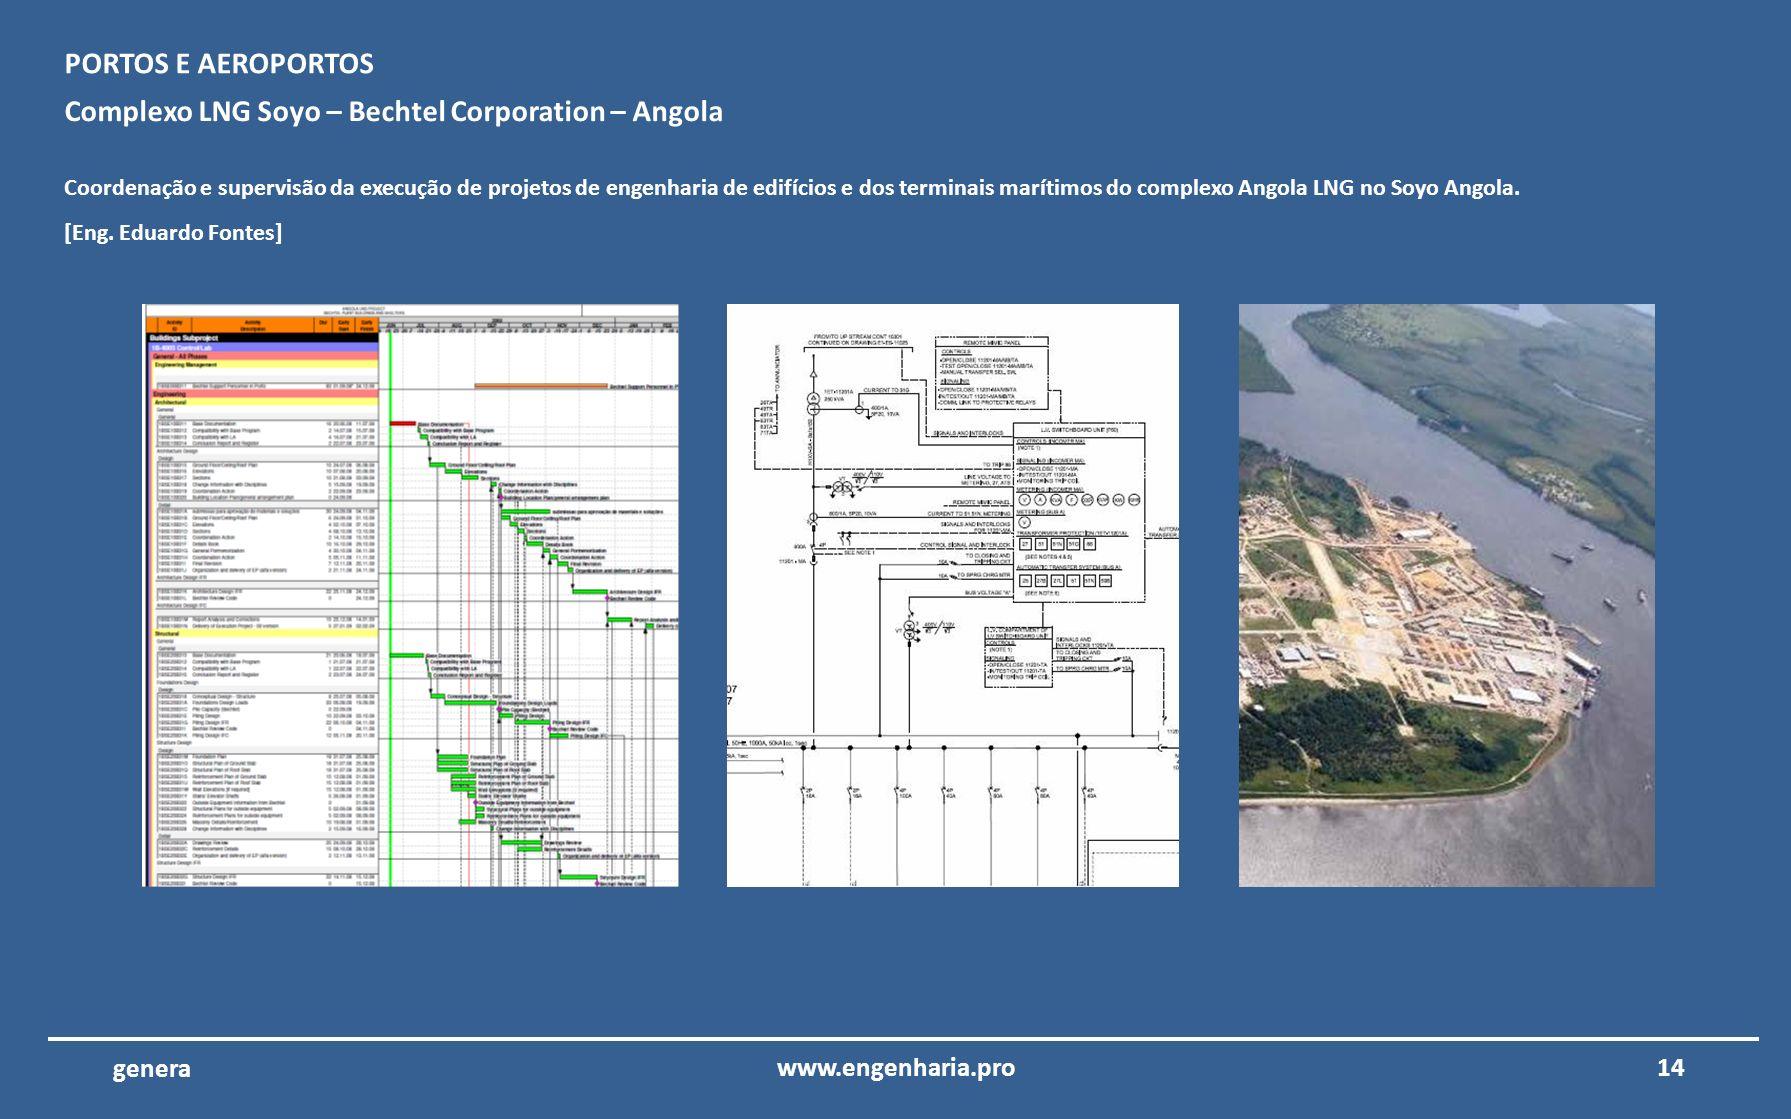 Complexo LNG Soyo – Bechtel Corporation – Angola